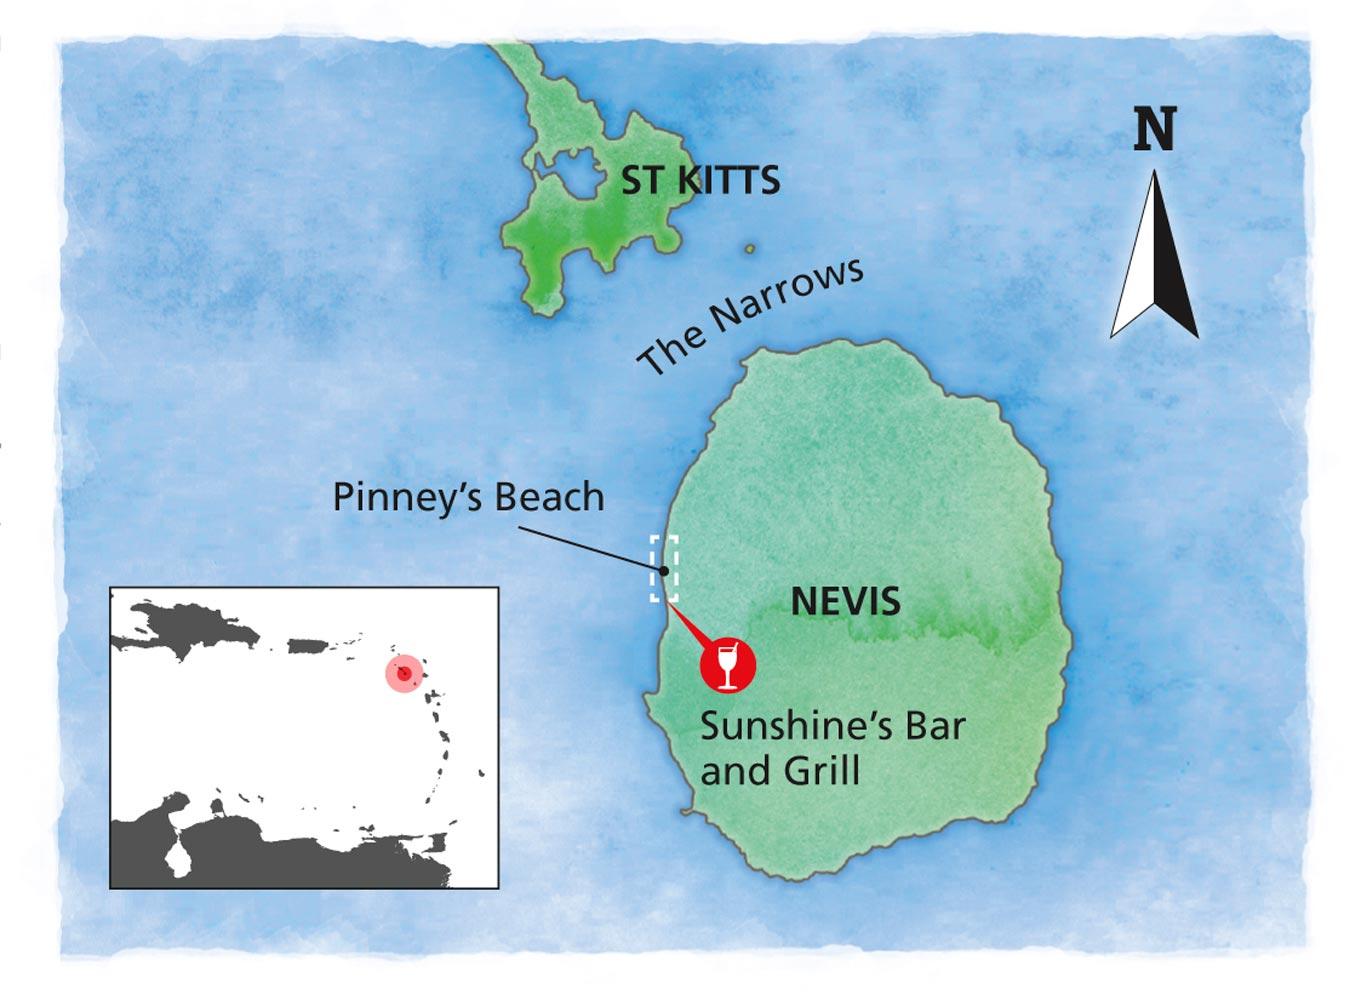 St Kitts & Nevis map